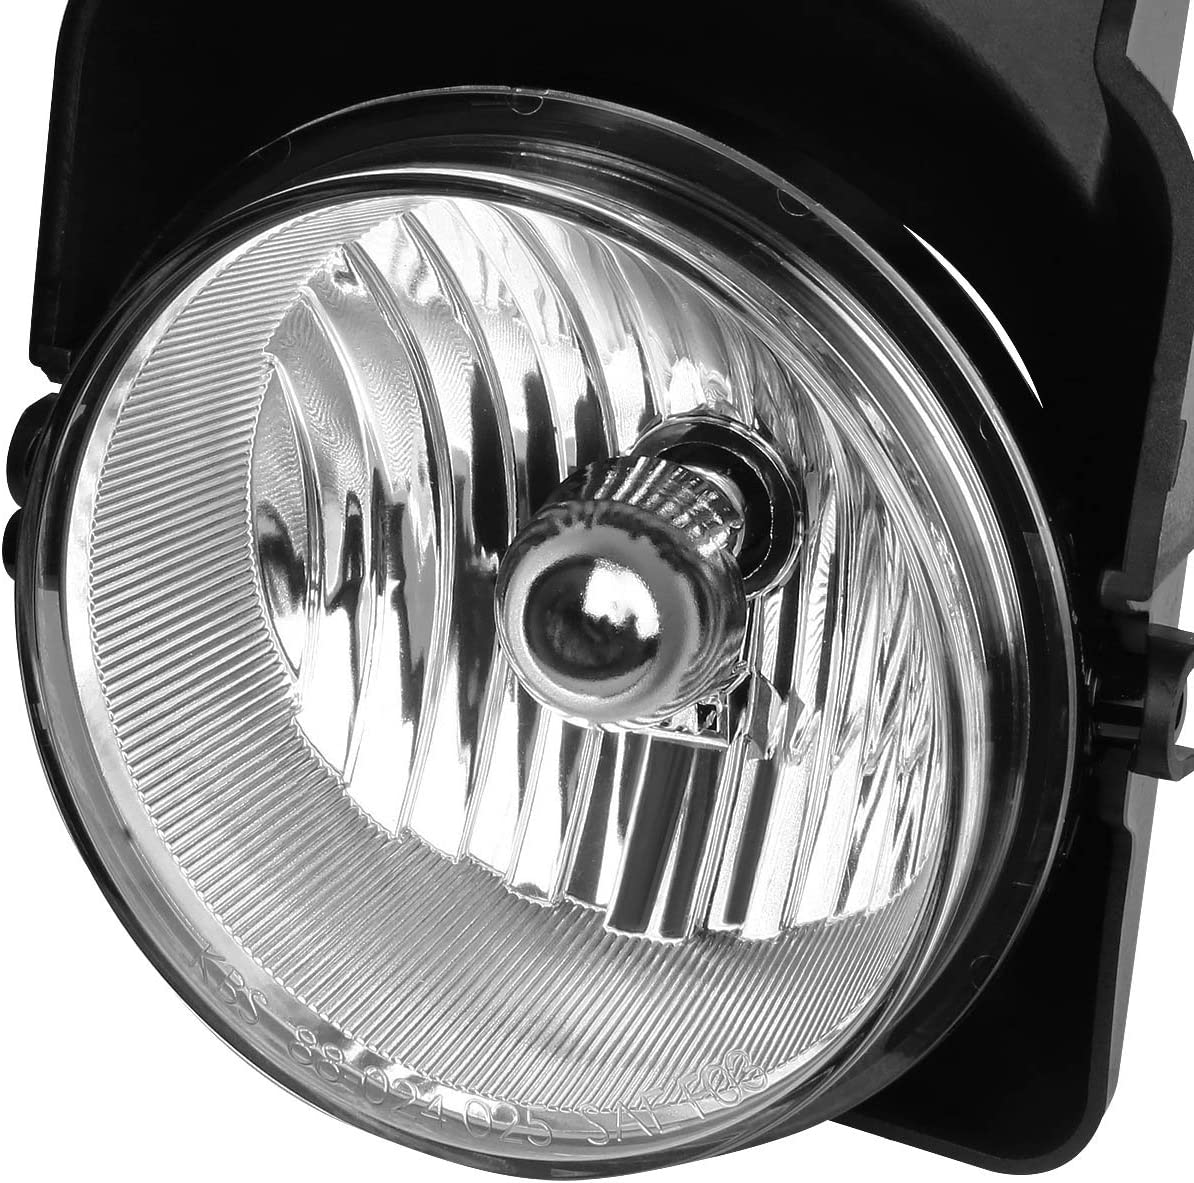 DNA Motoring FL-NS016-CH Front Bumper Fog Light